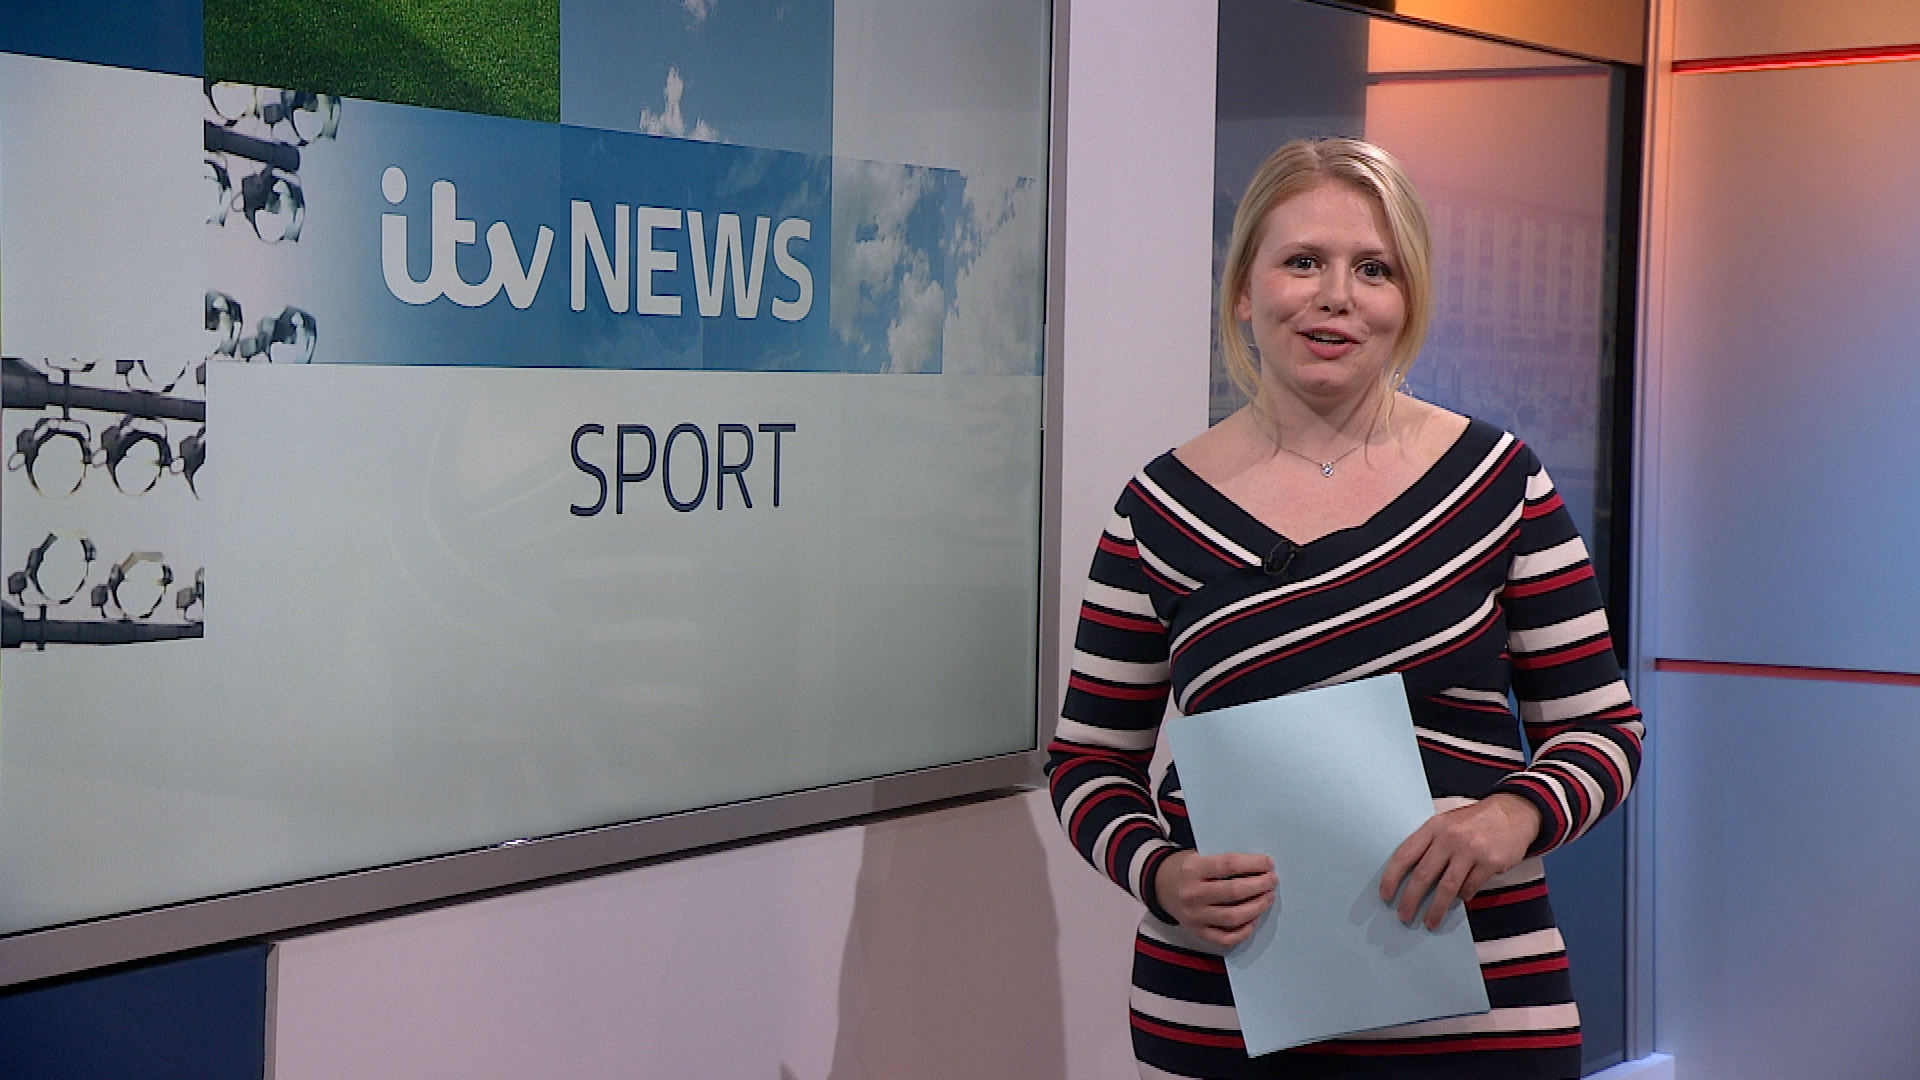 ITV sport pic